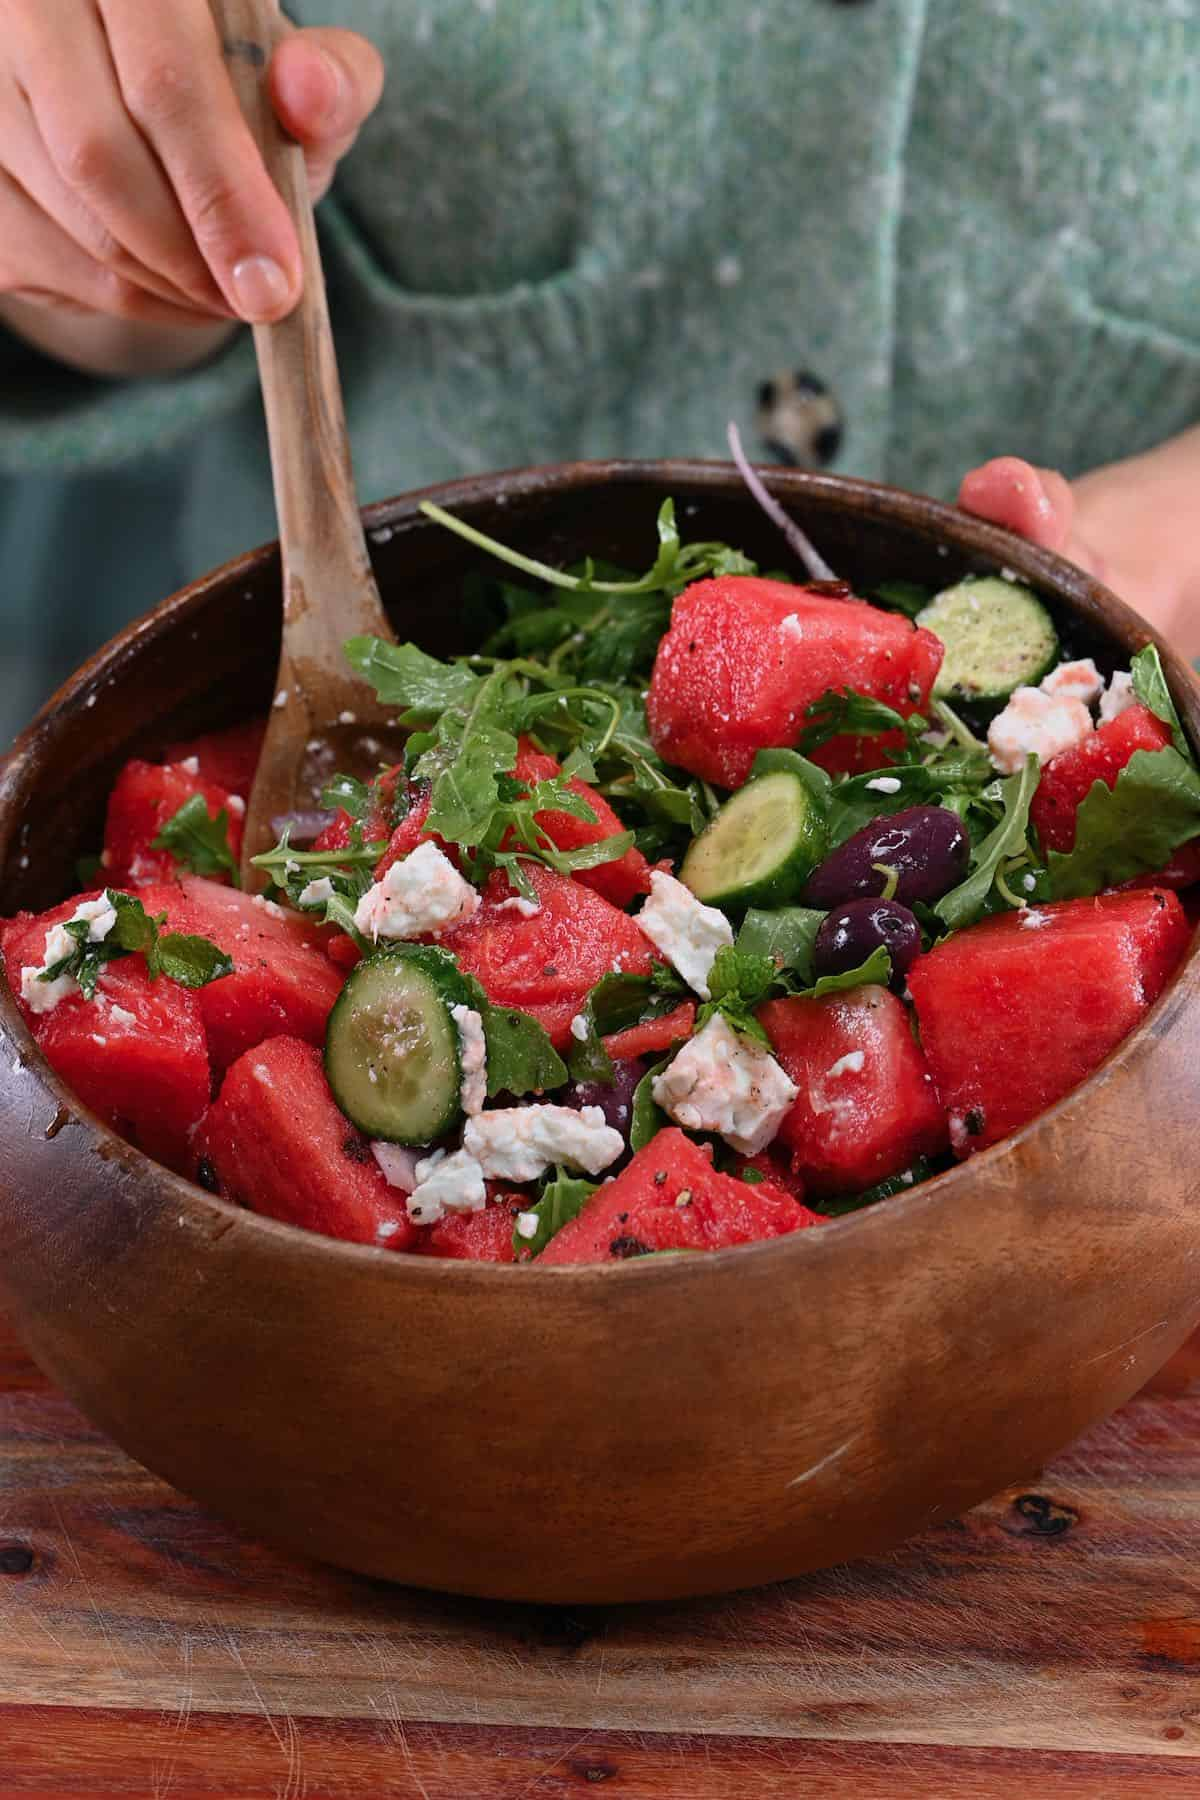 Mixing watermelon salad